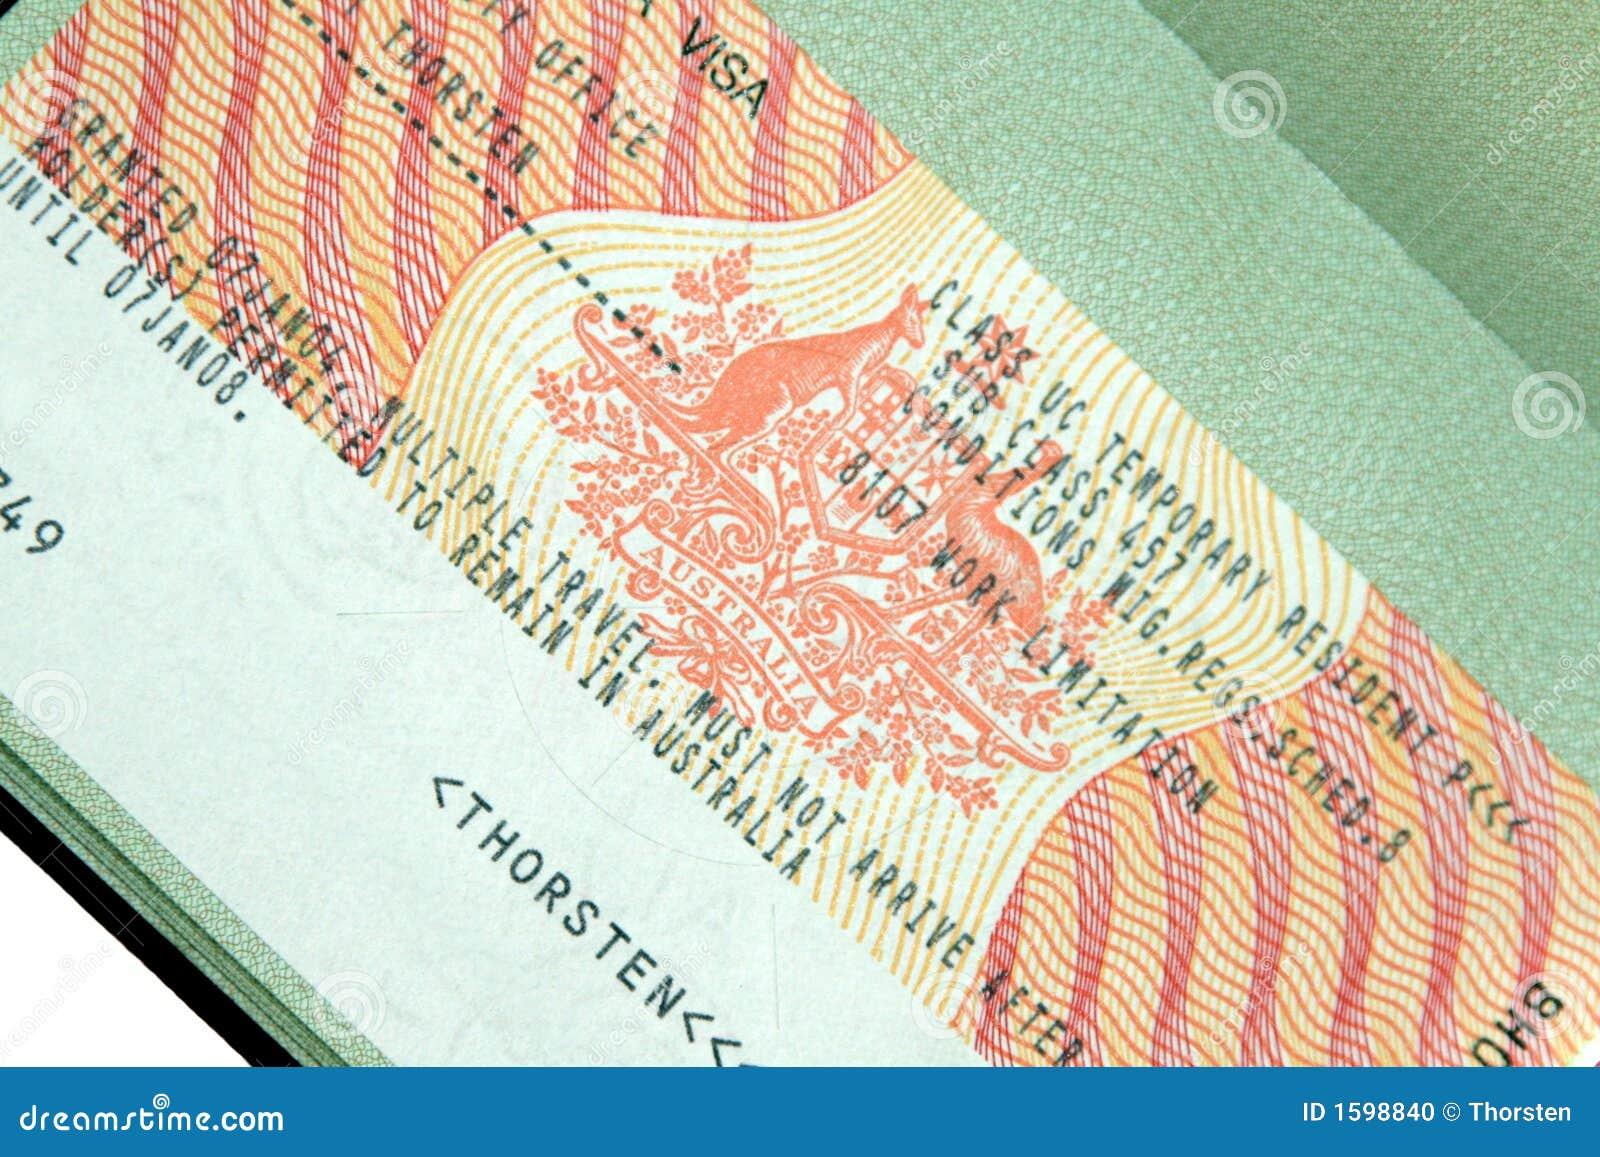 Australian Visa Stock Photo - Image: 1598840